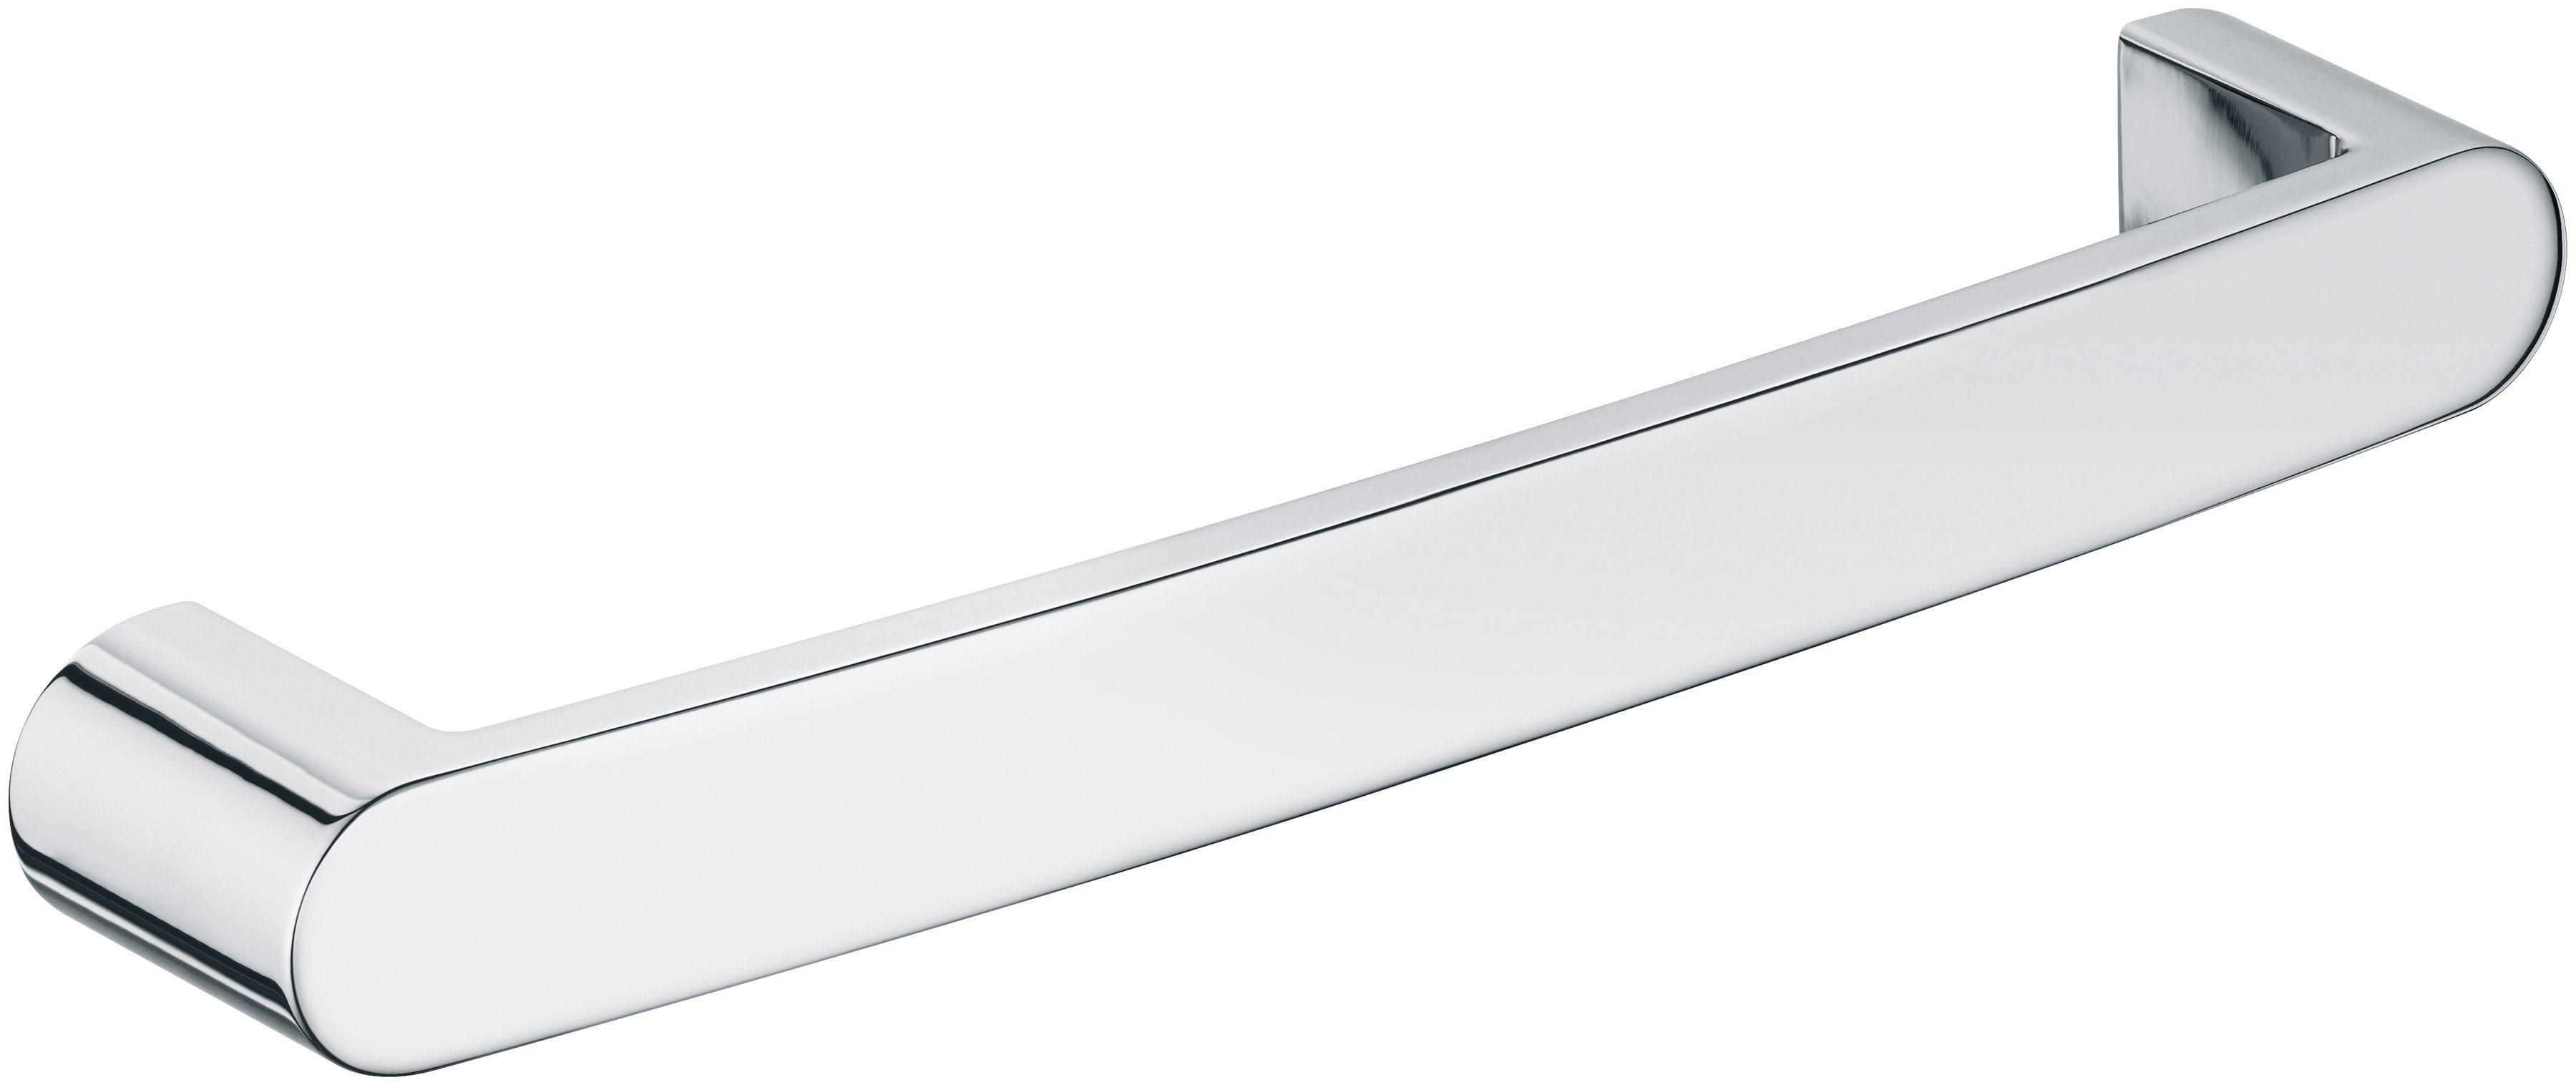 KEUCO Haltegriff »Elegance«, Breite: 300 mm, verchromt | Bad > Bad-Accessoires > Haltegriffe | Keuco